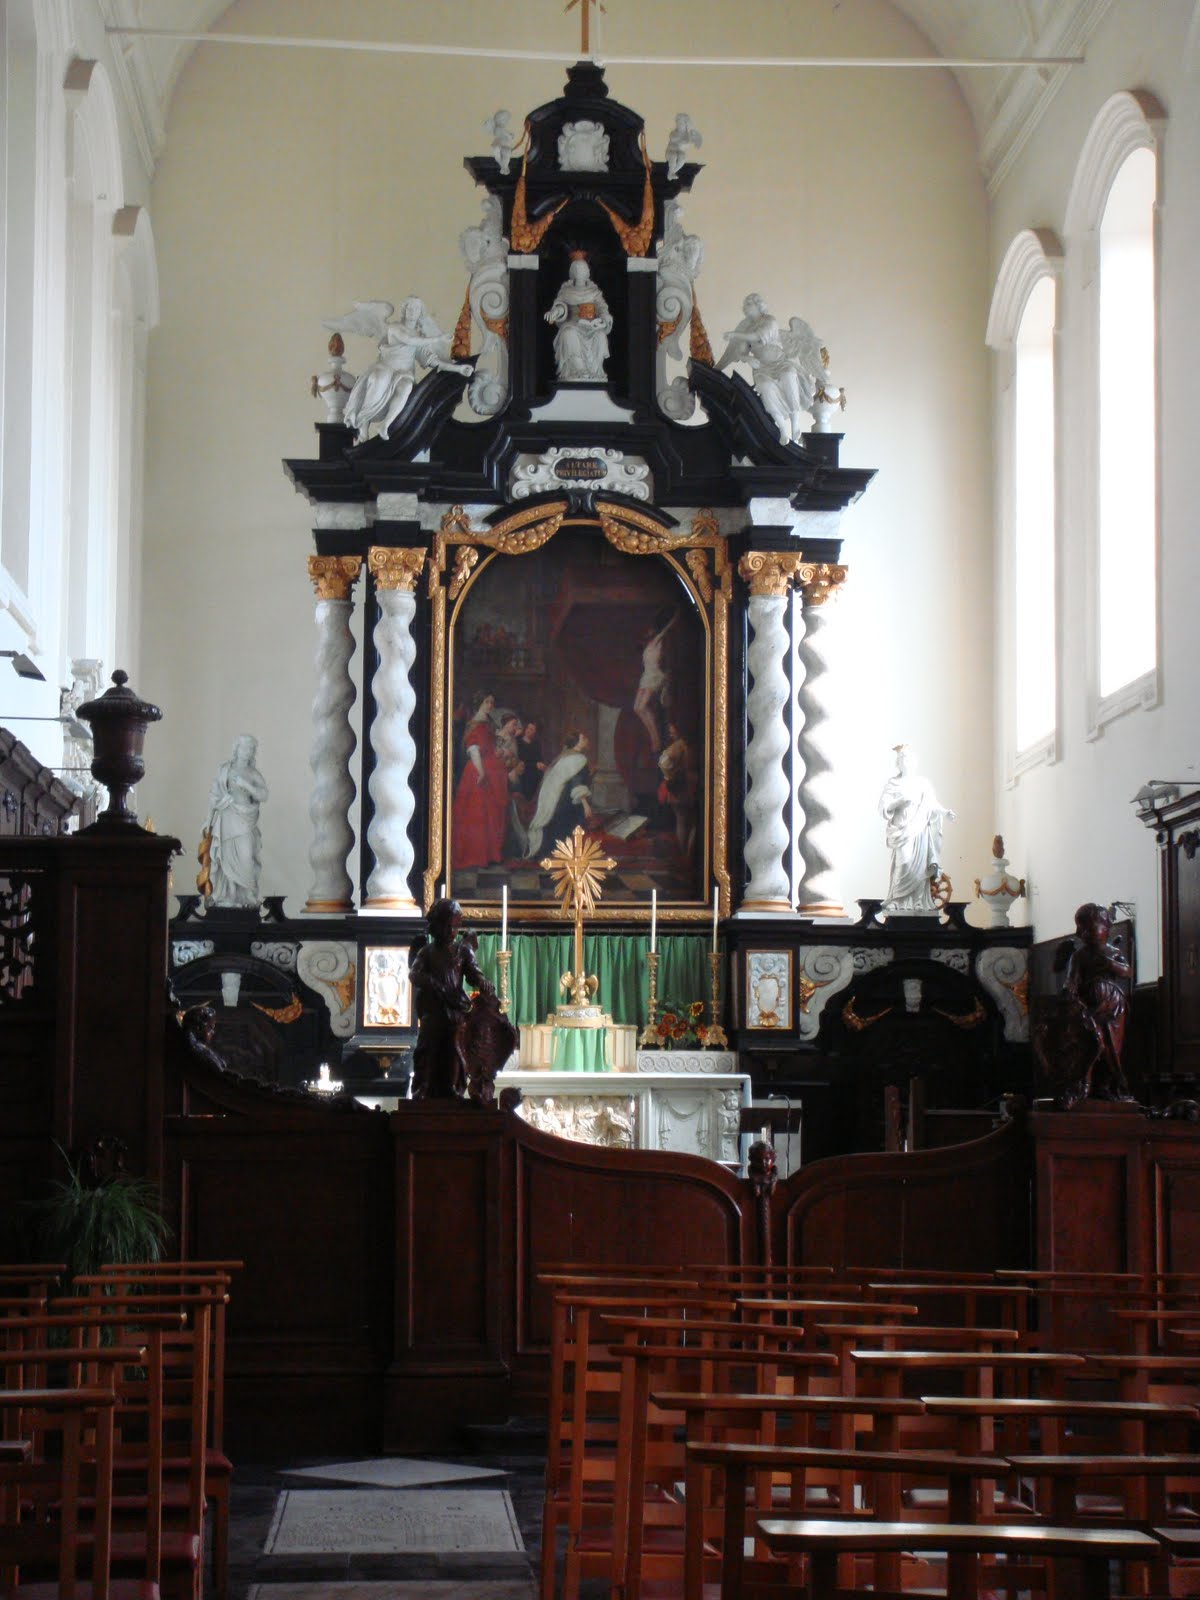 Beguinaje, Convento Medieval de Brujas, Elisa N, Blog de Viajes, Lifestyle, Travel